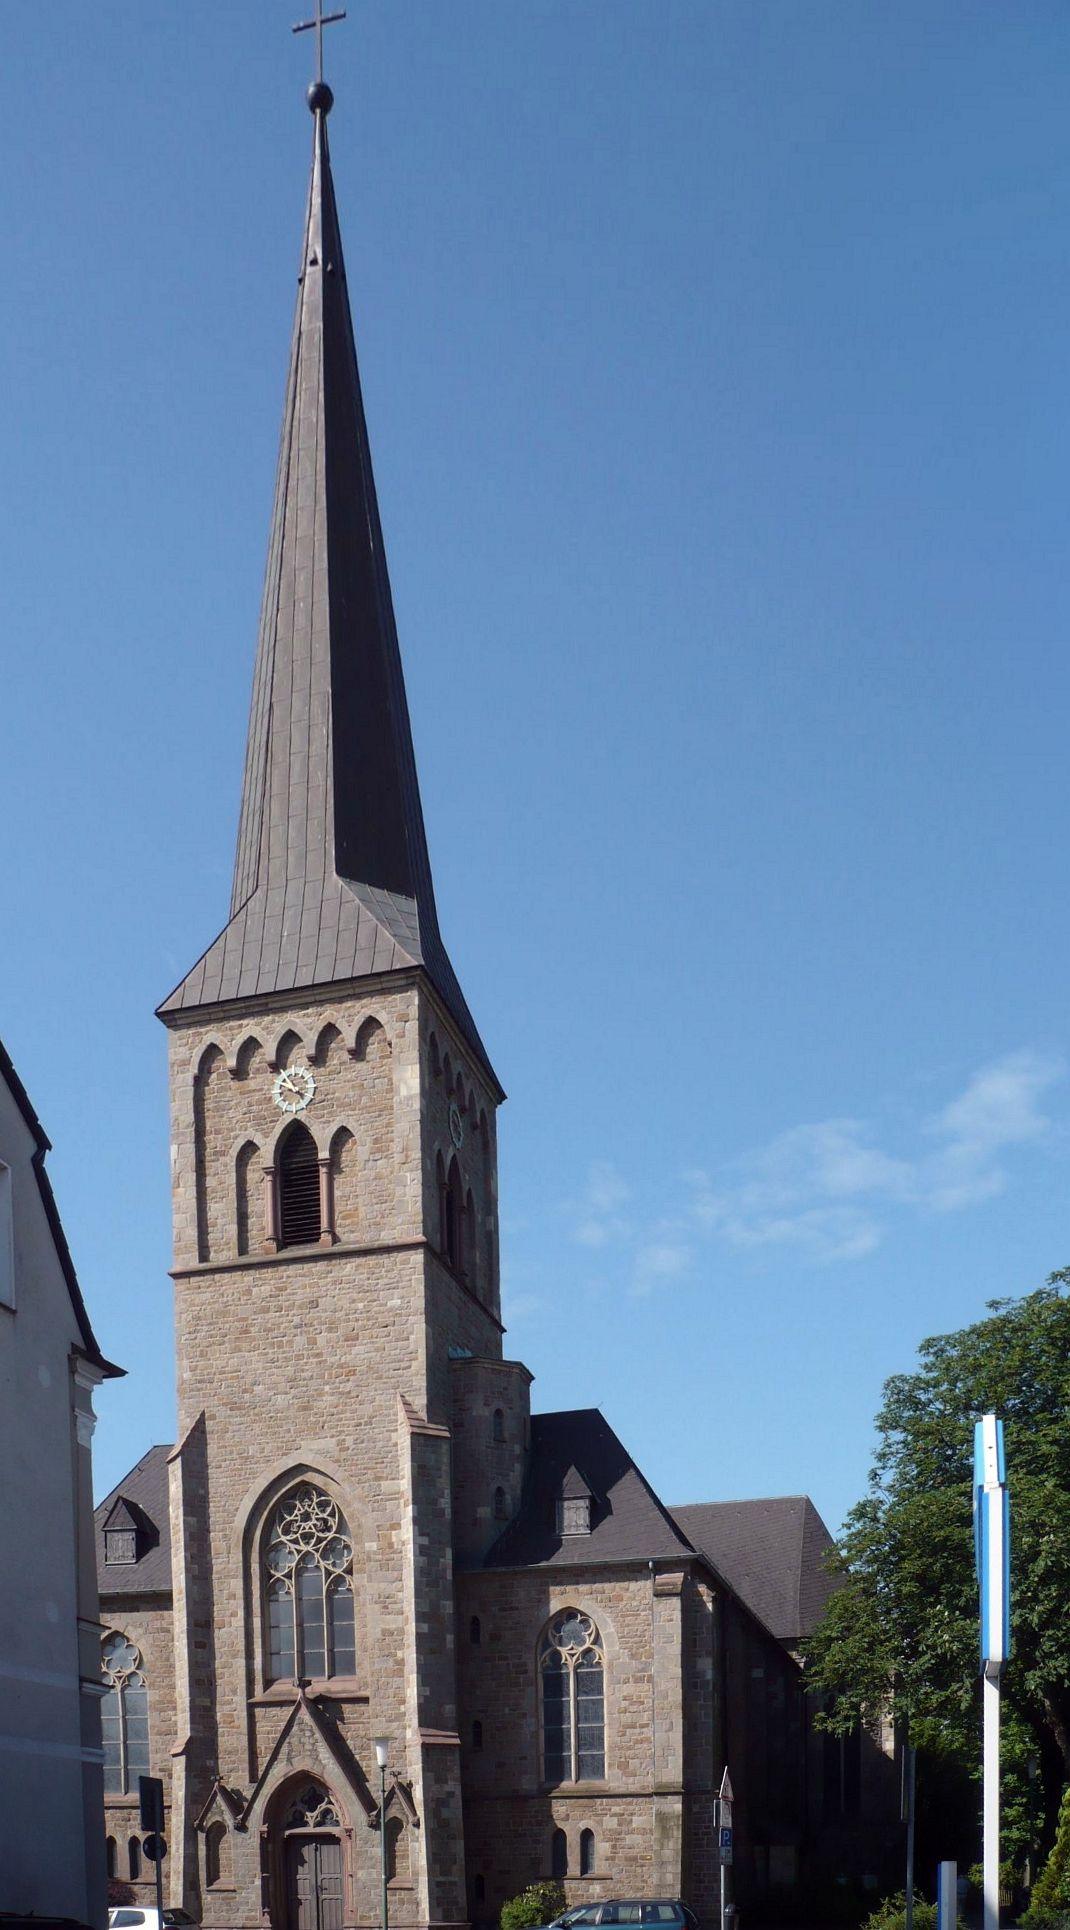 Datei:St. Georg Essen-Heisingen.jpg – Wikipedia